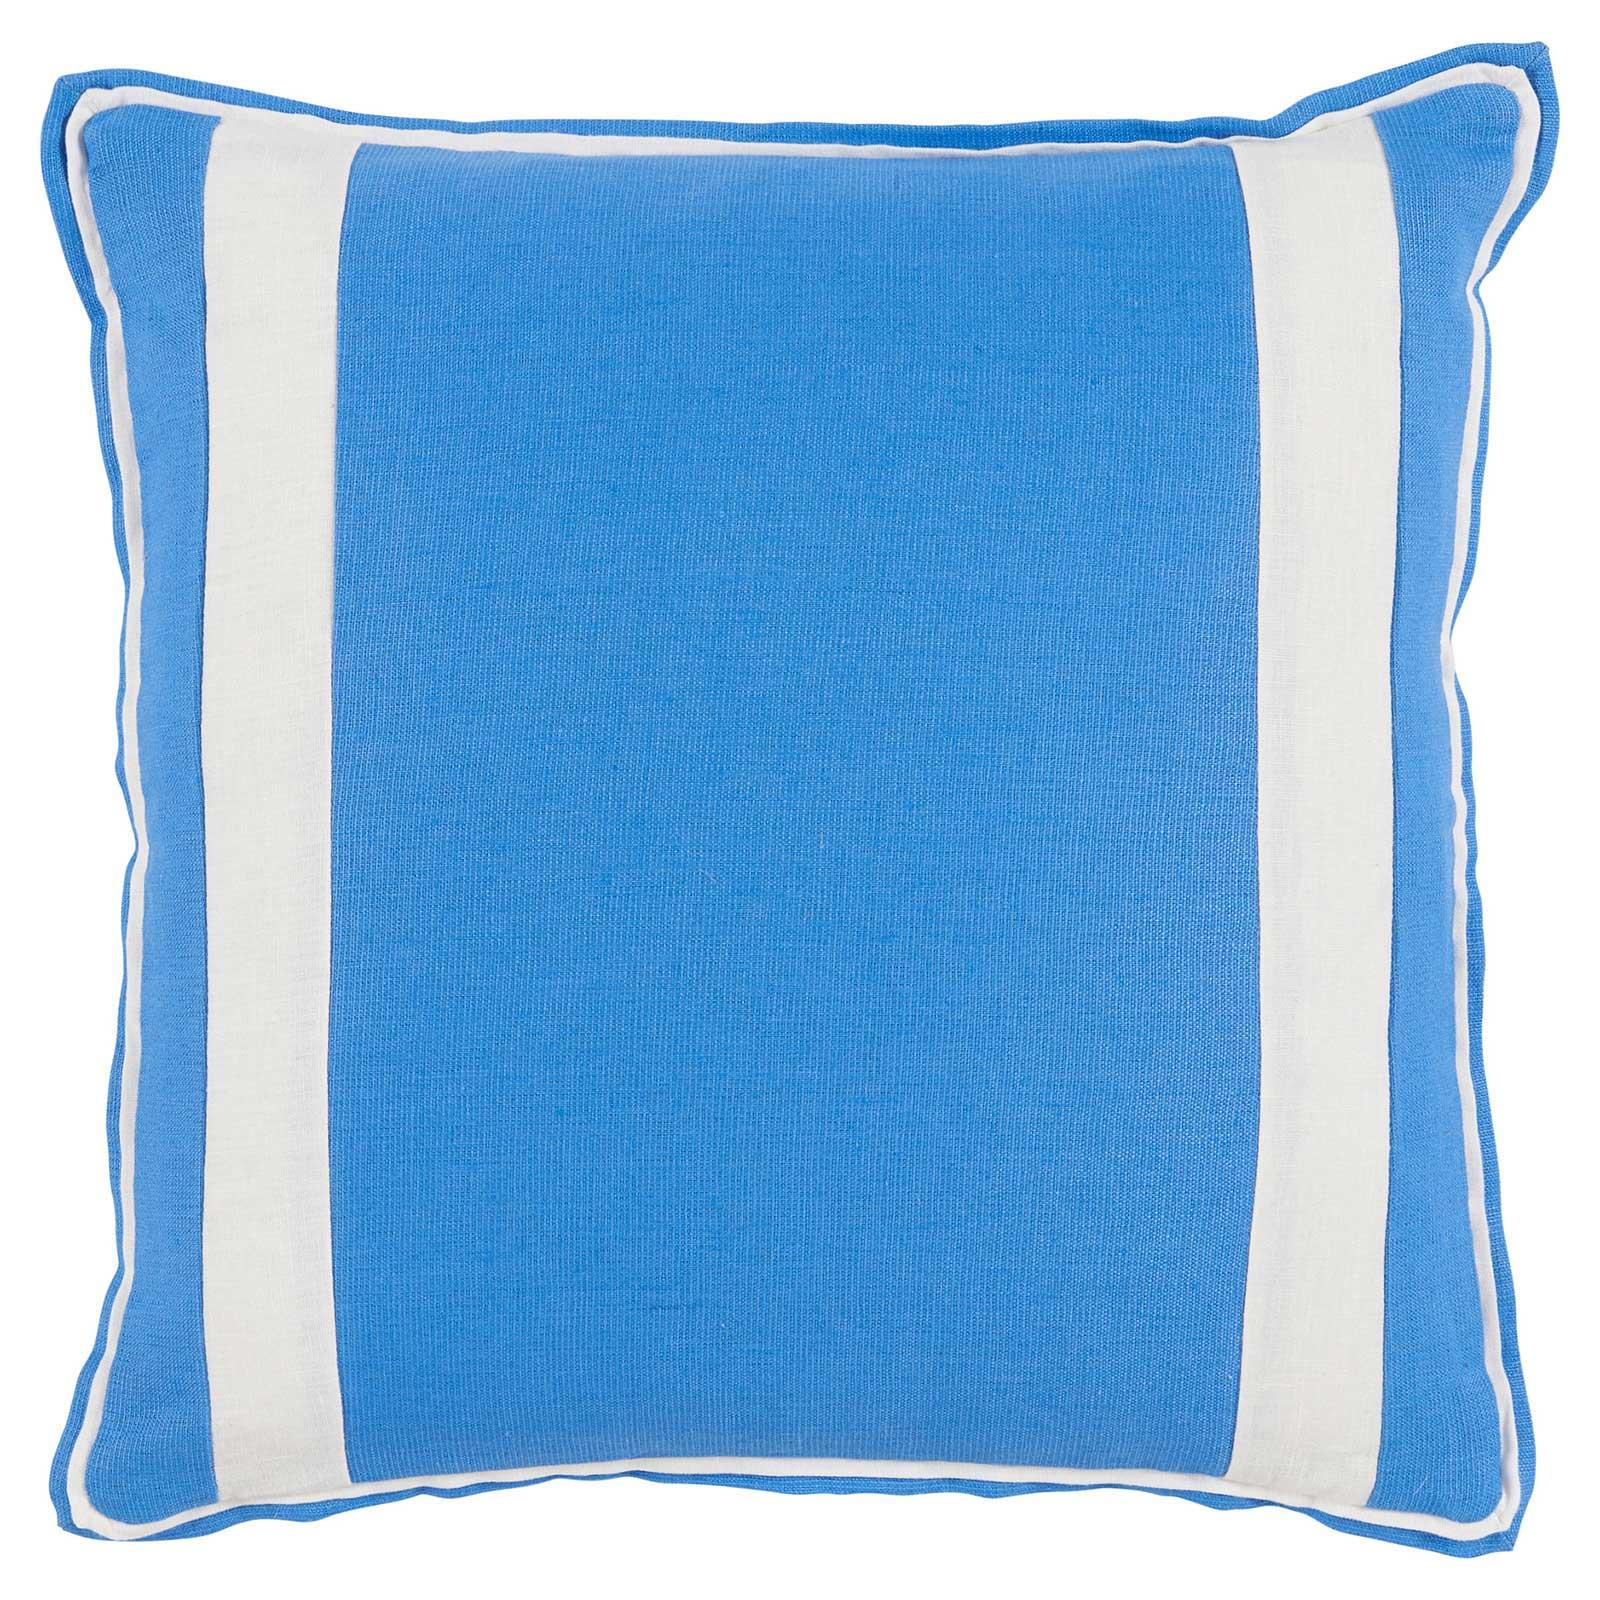 Bobbi Modern Classic Bold Stripe Bright Blue Linen Pillow - 20x20